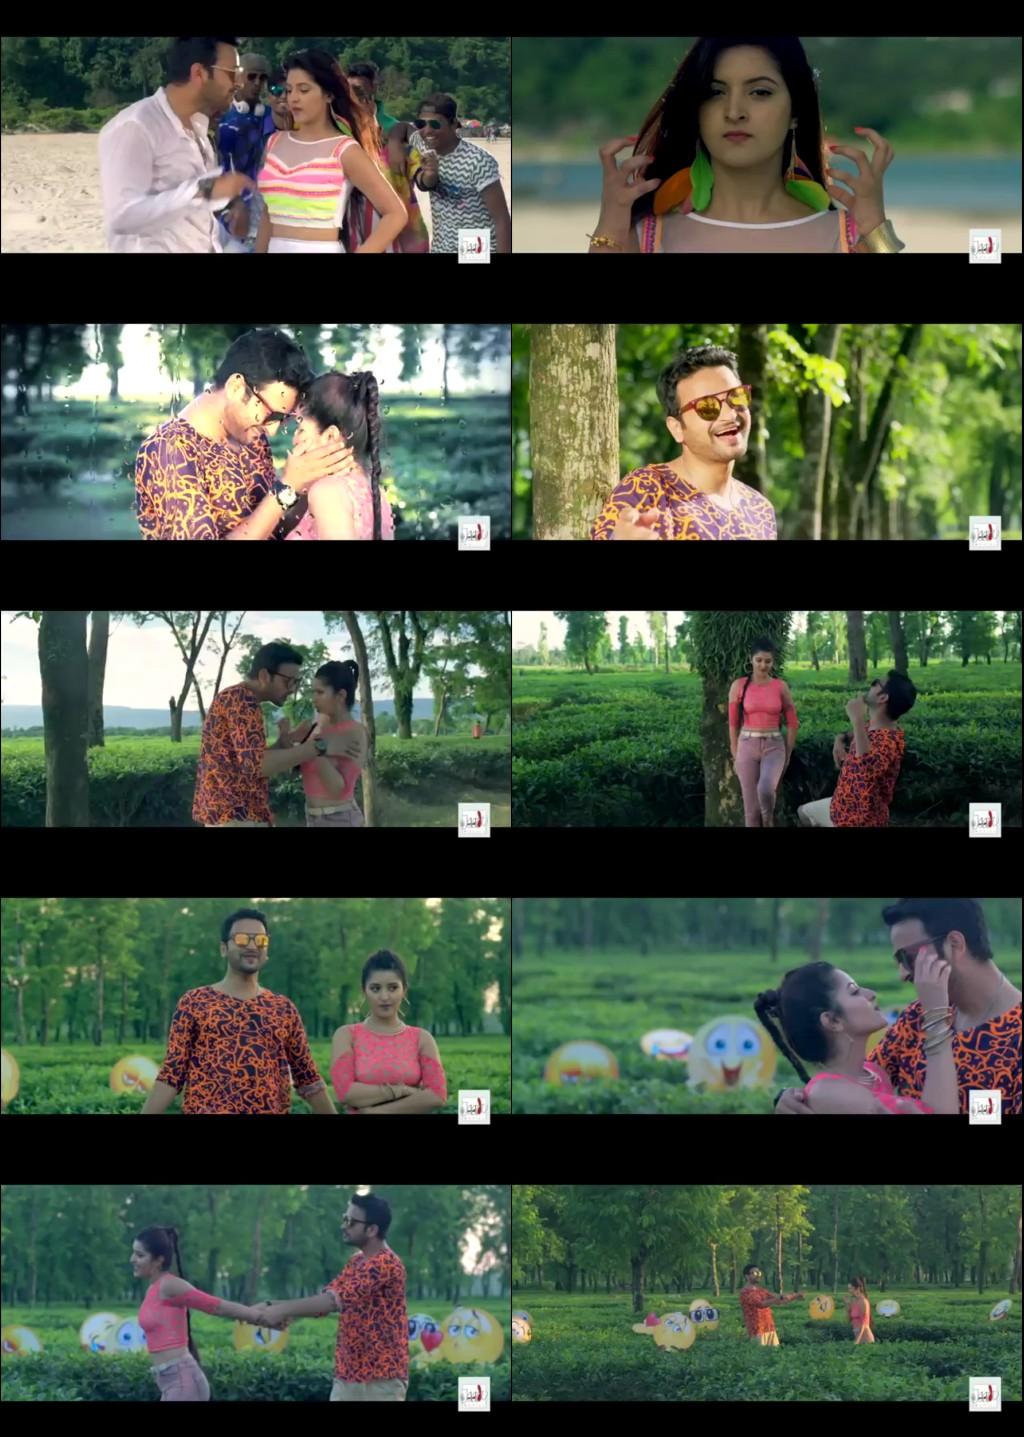 Facebook-Love-Official-Video-l-Nodir-Bookey-Chaad-l-Pori-Moni-l-Symon-Sadik-l-Akassh-l-Shawkat-YT-36